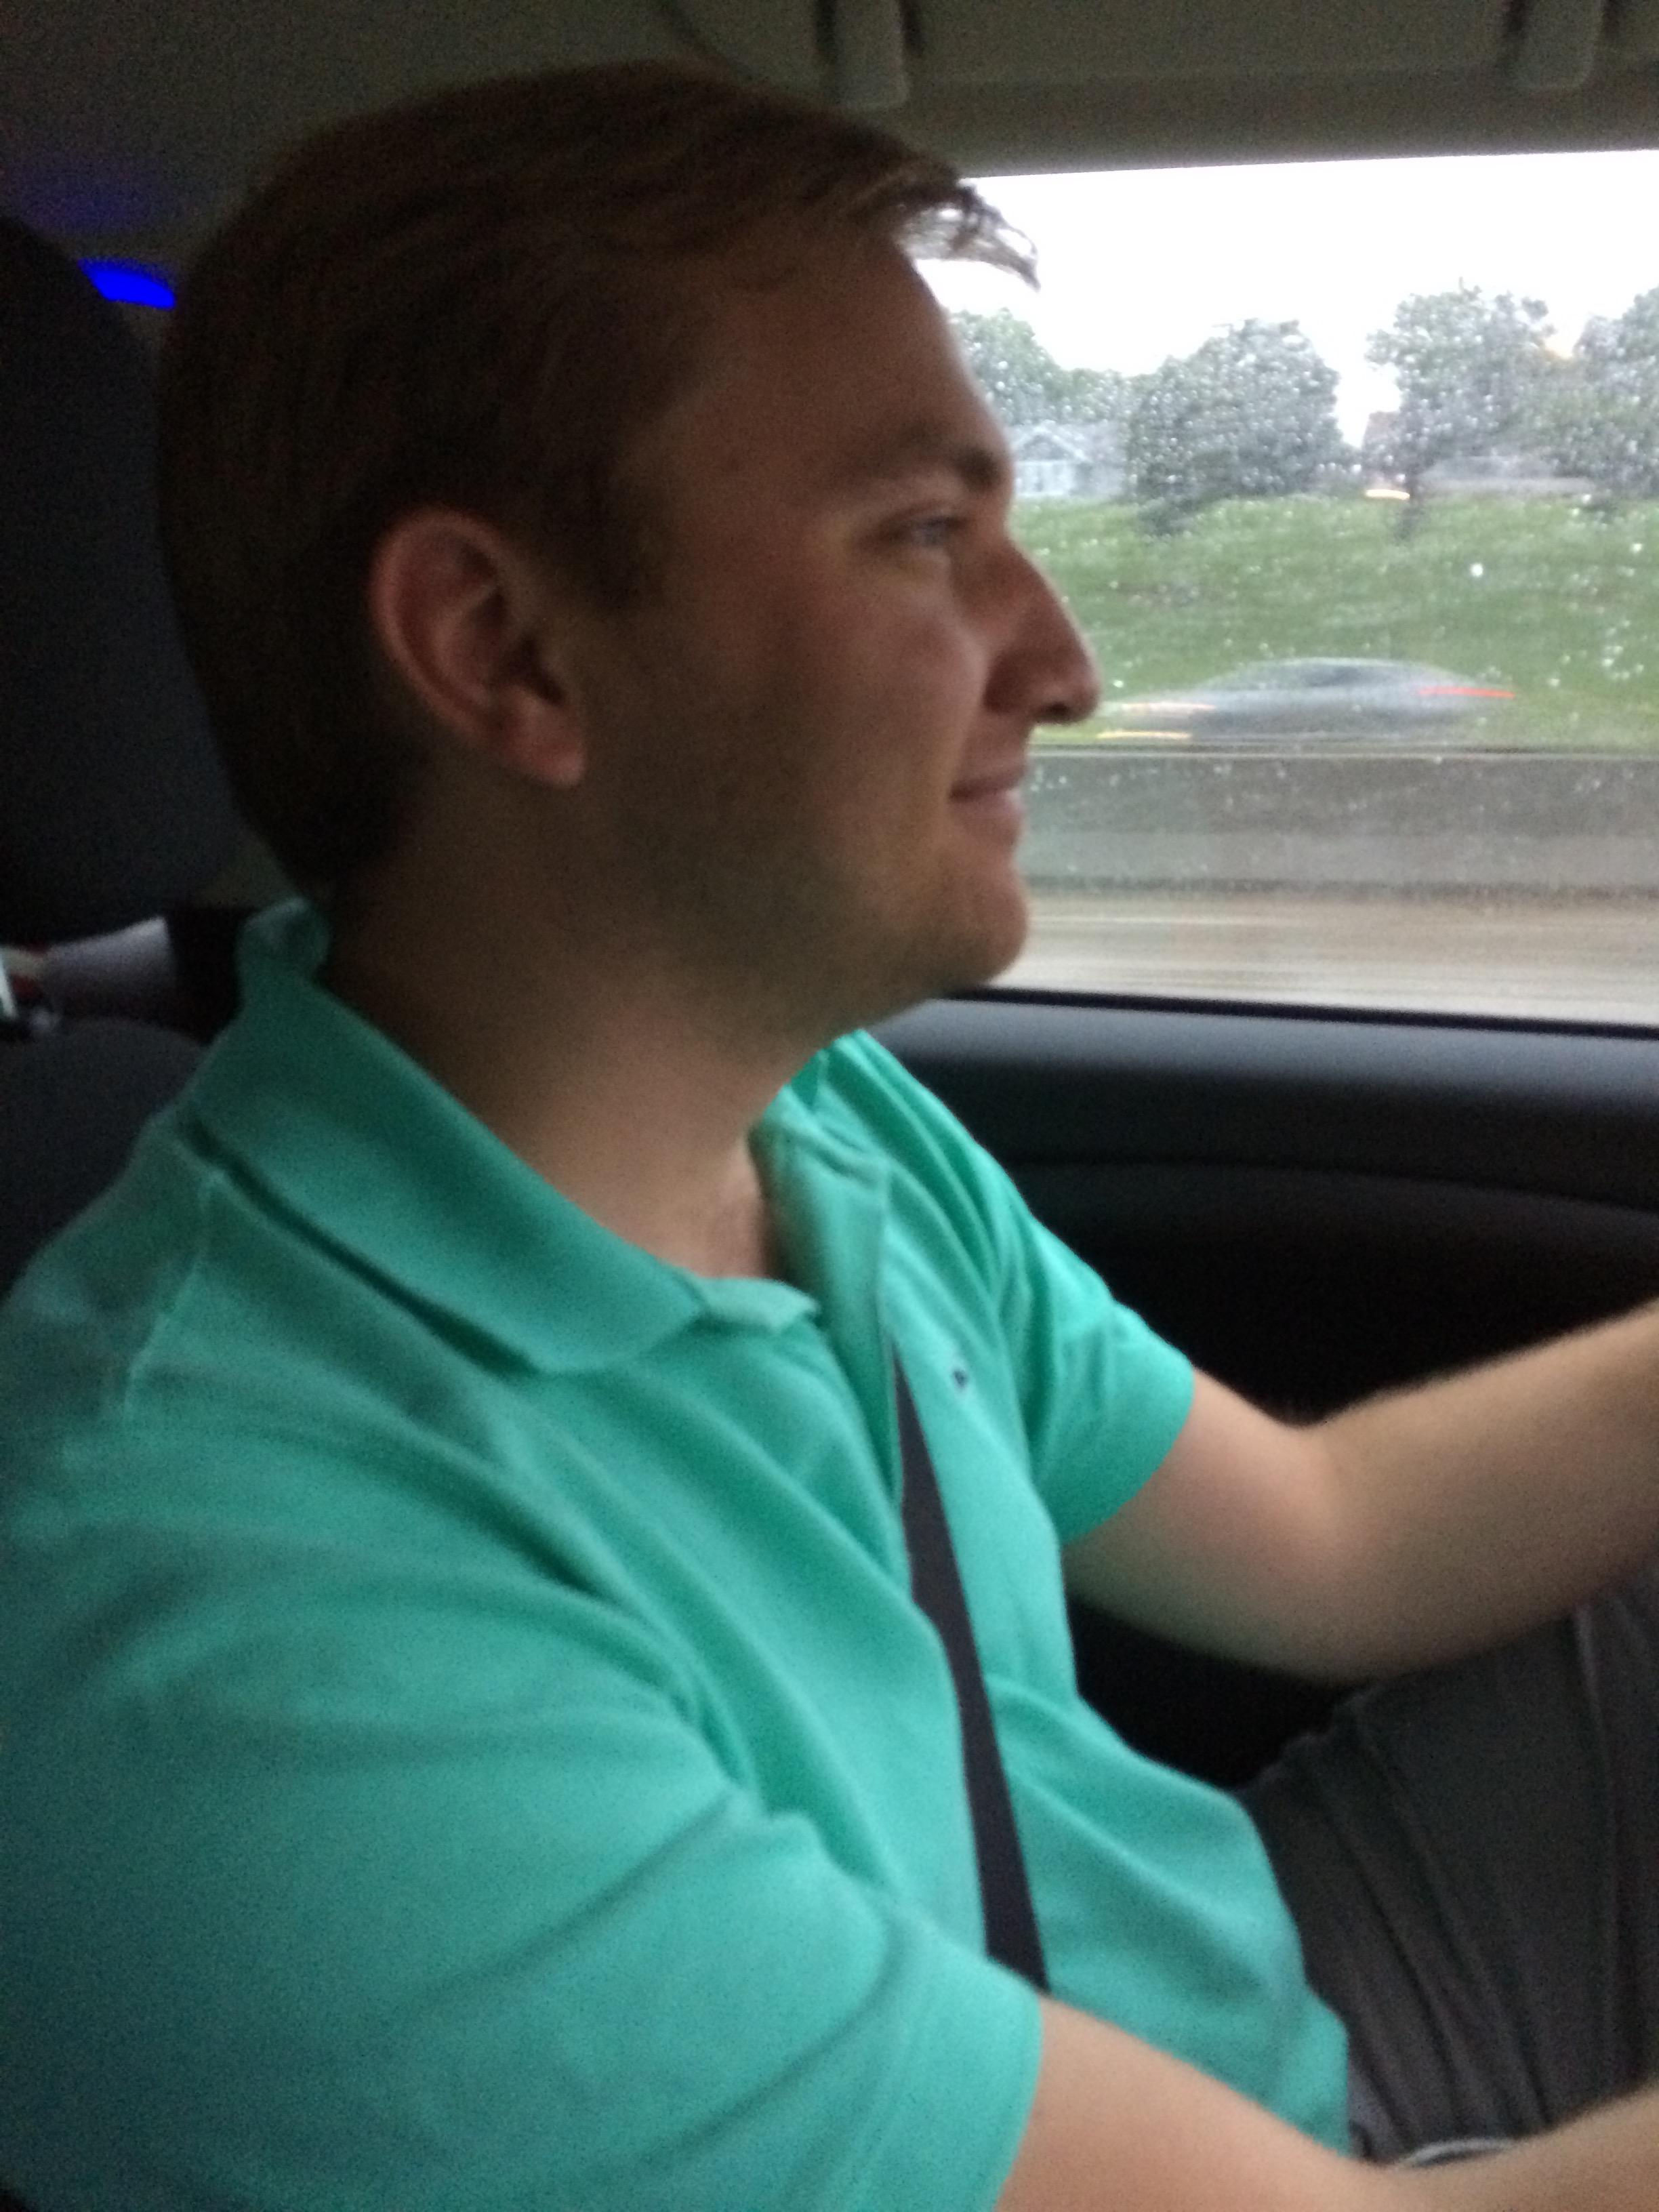 driving to scuba open water certification in arkansas